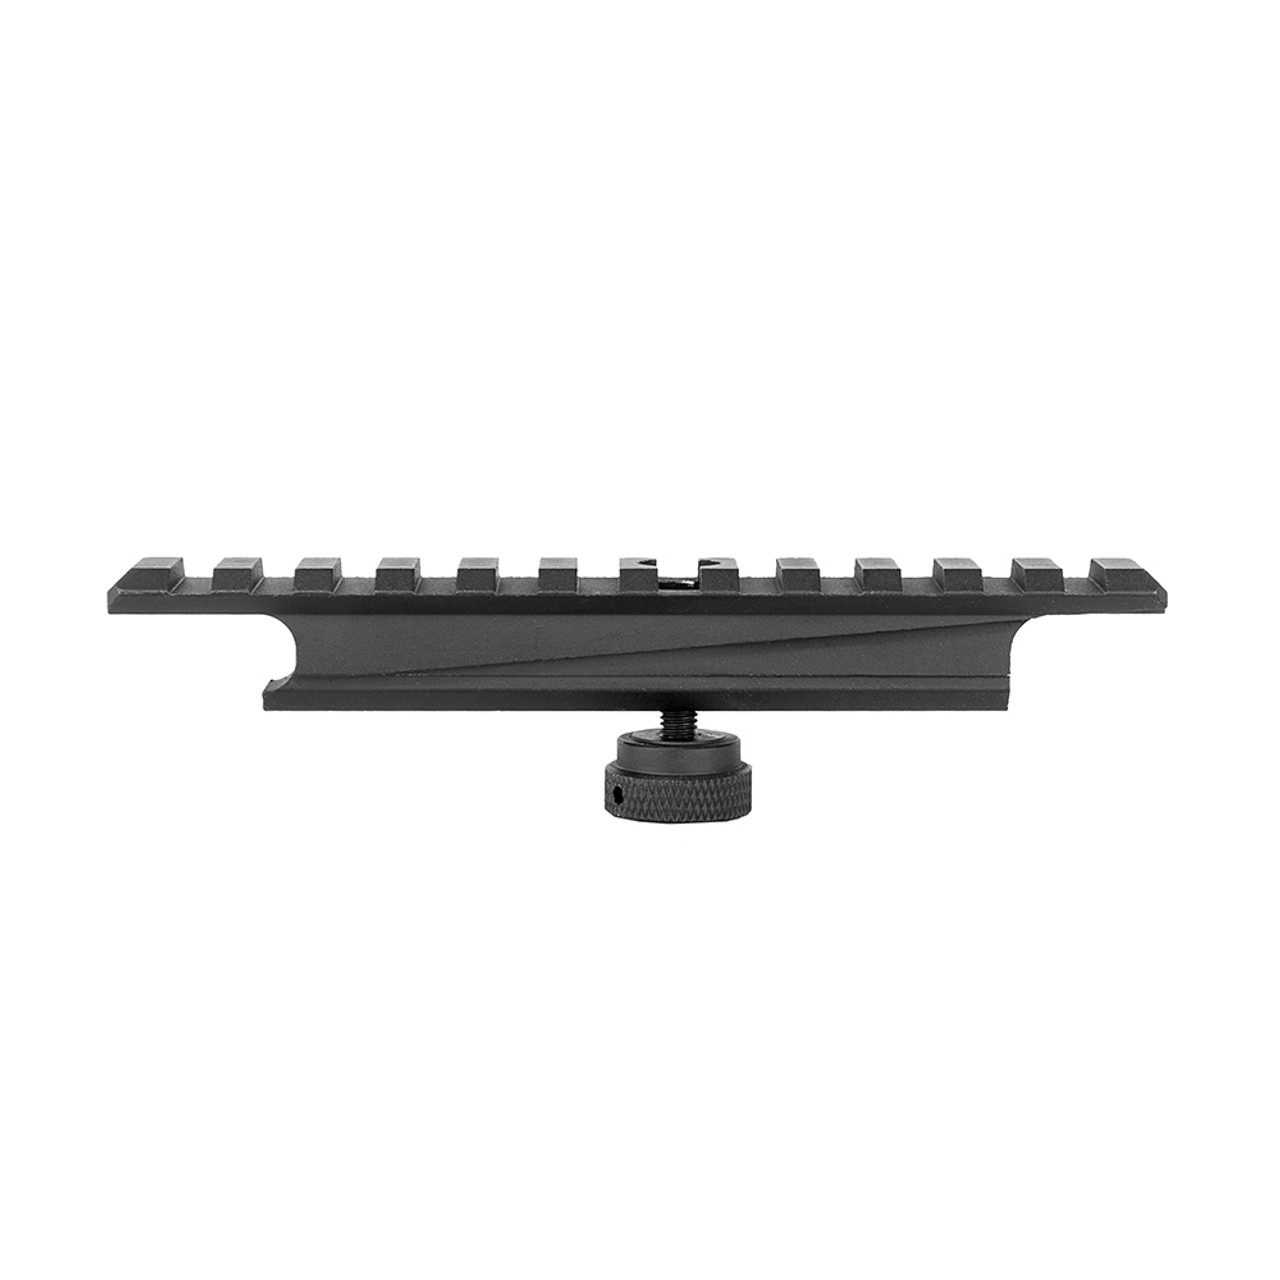 VISM AR Carry Handle - Picatinny rail NEW (MAR6M2) Right